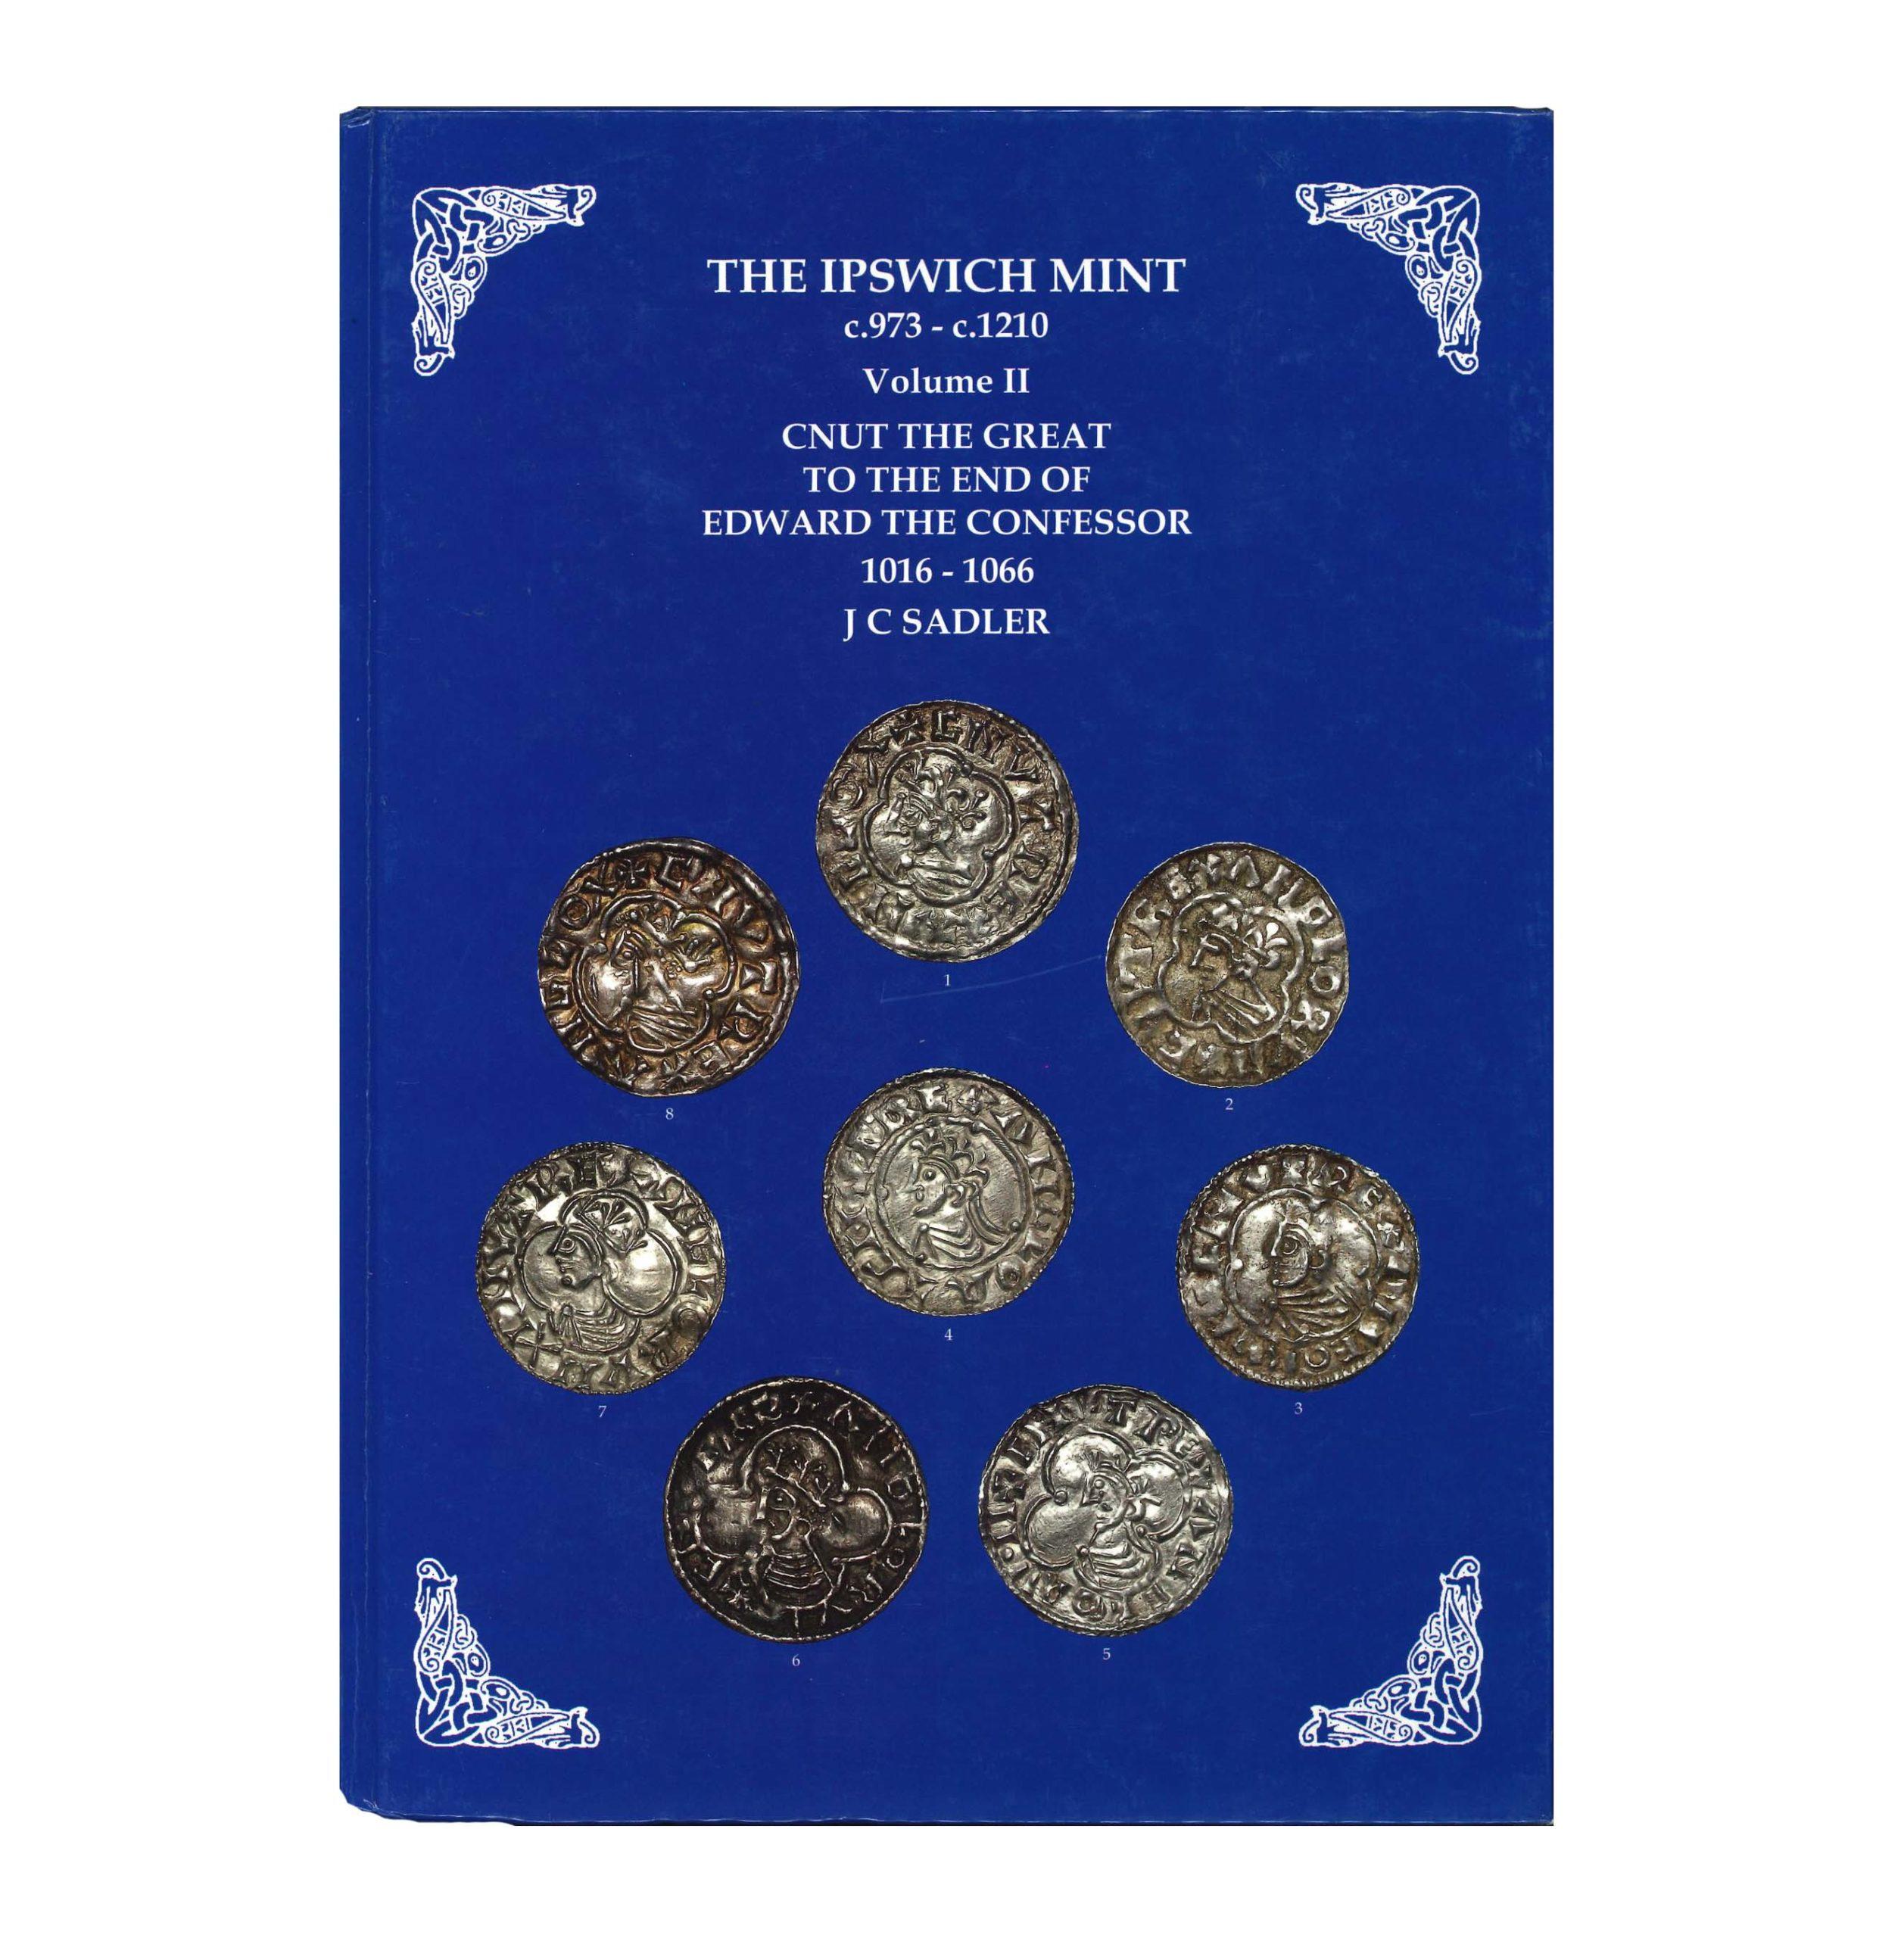 The Ipswich Mint c.973 - c.1210, volume II